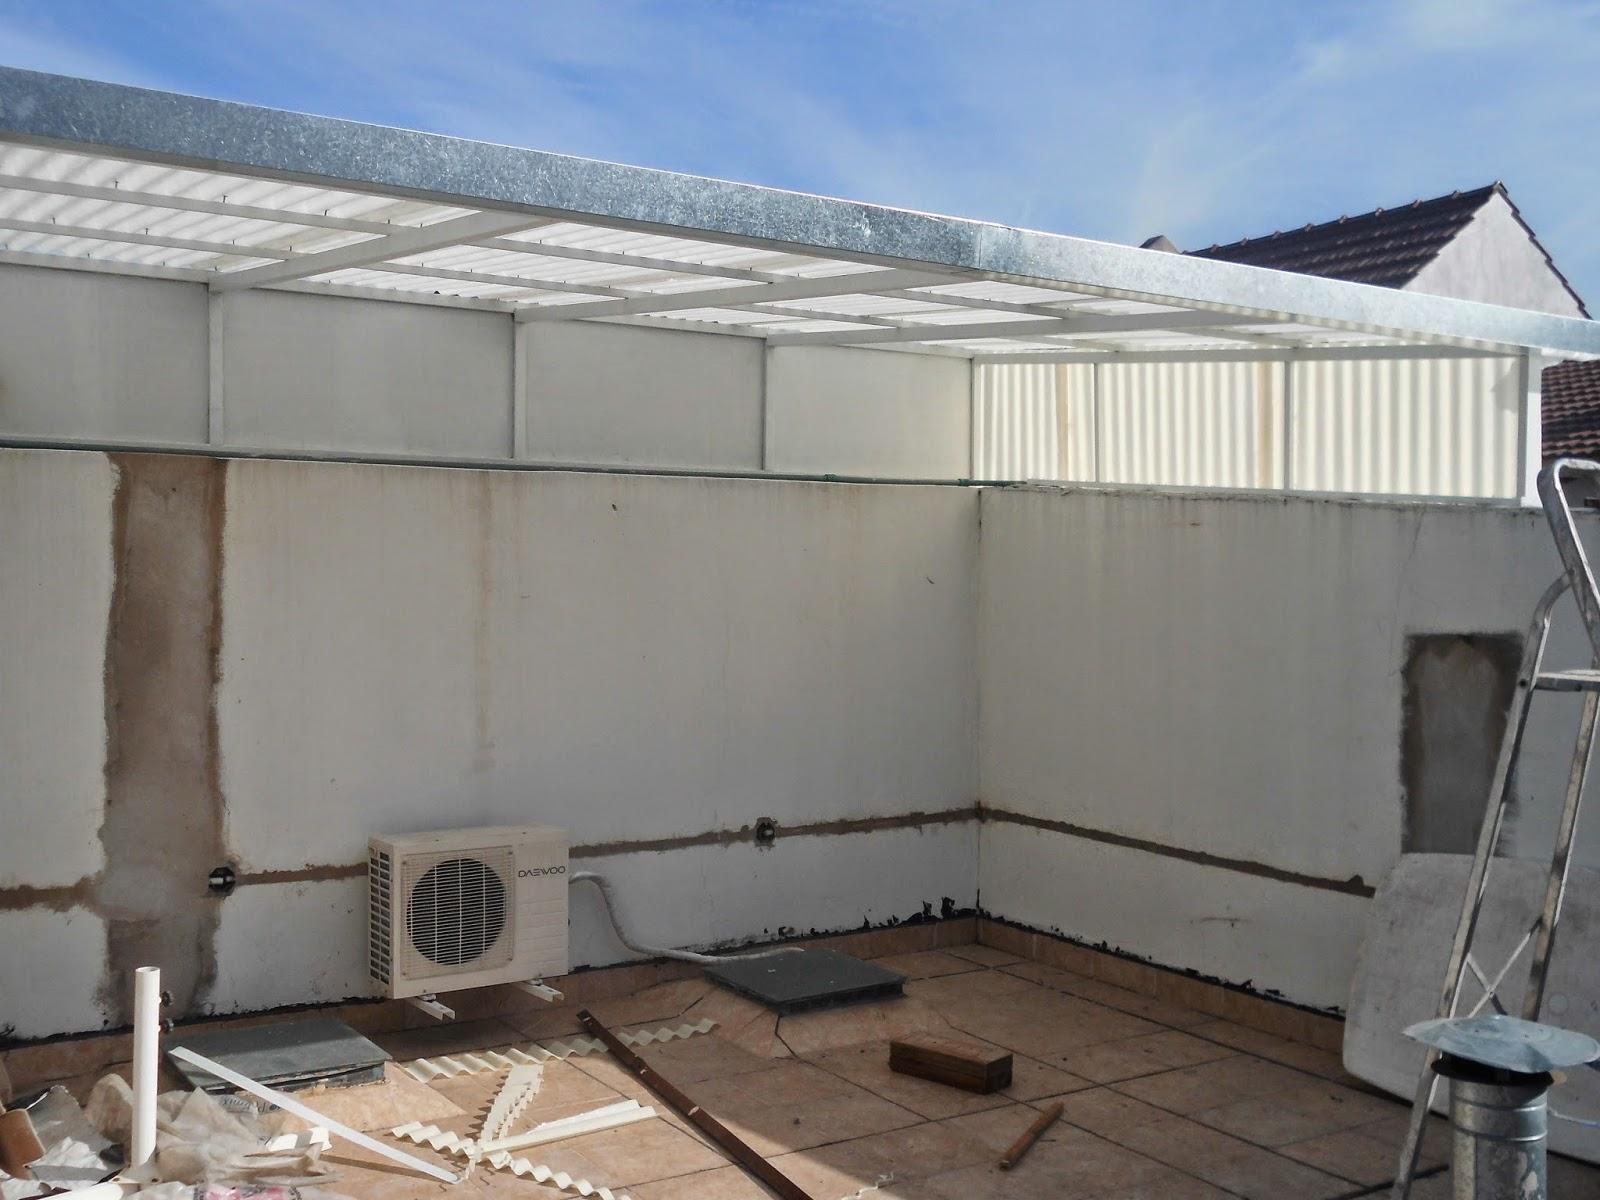 Entrepisos de madera escaleras techo chapa blanca con for Escalera de madera para entrepiso